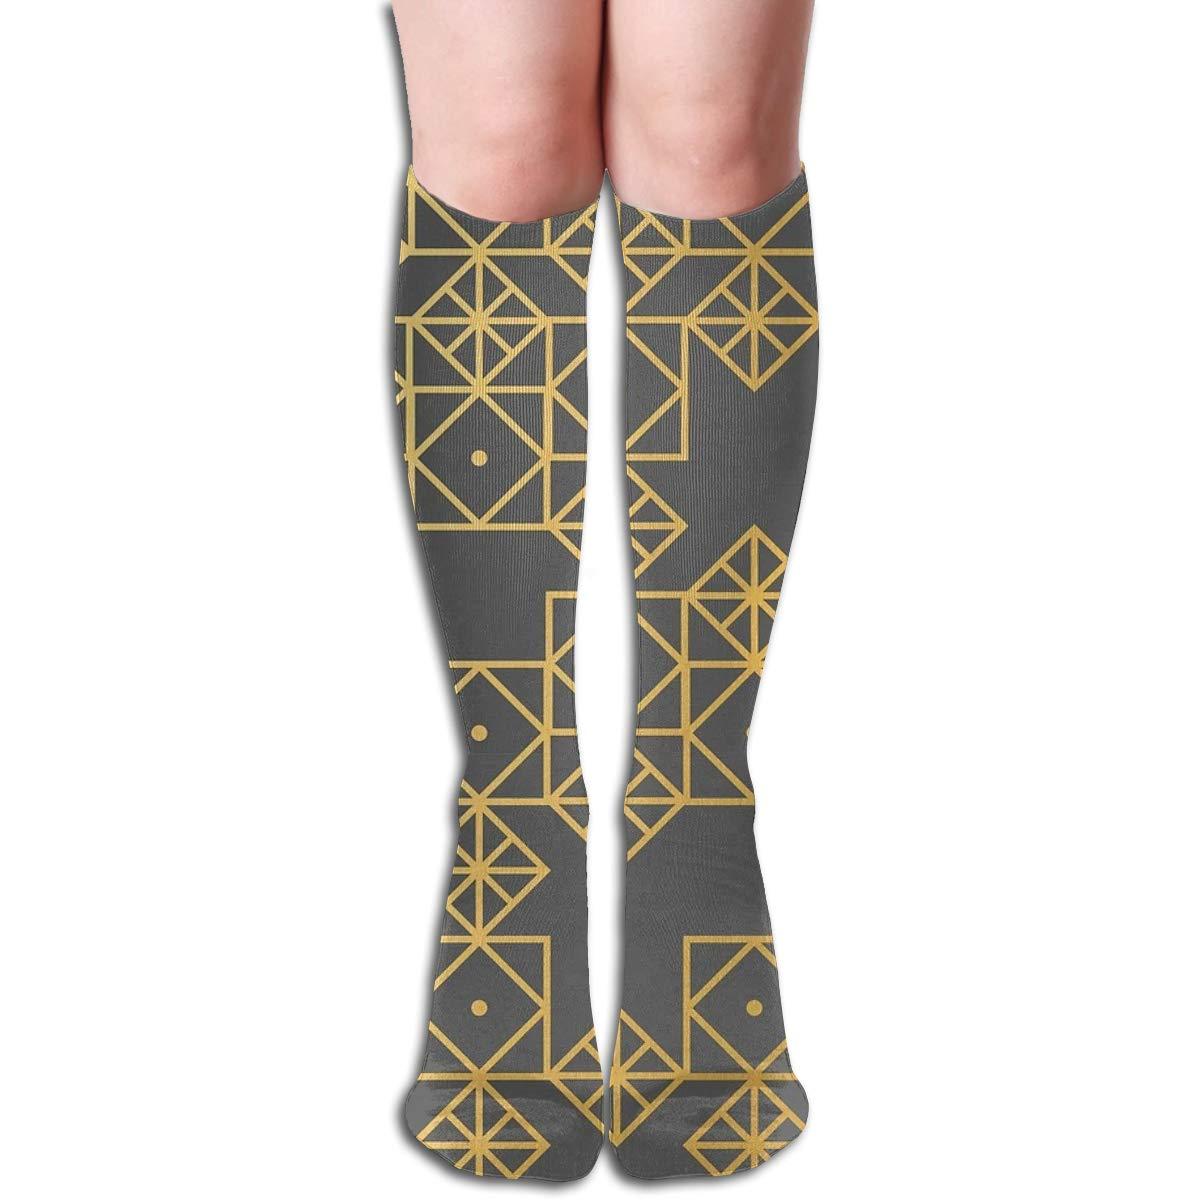 Geometric Gold Unisex Compression Socks Athletic Tube Stockings Sport Long Socks One Size